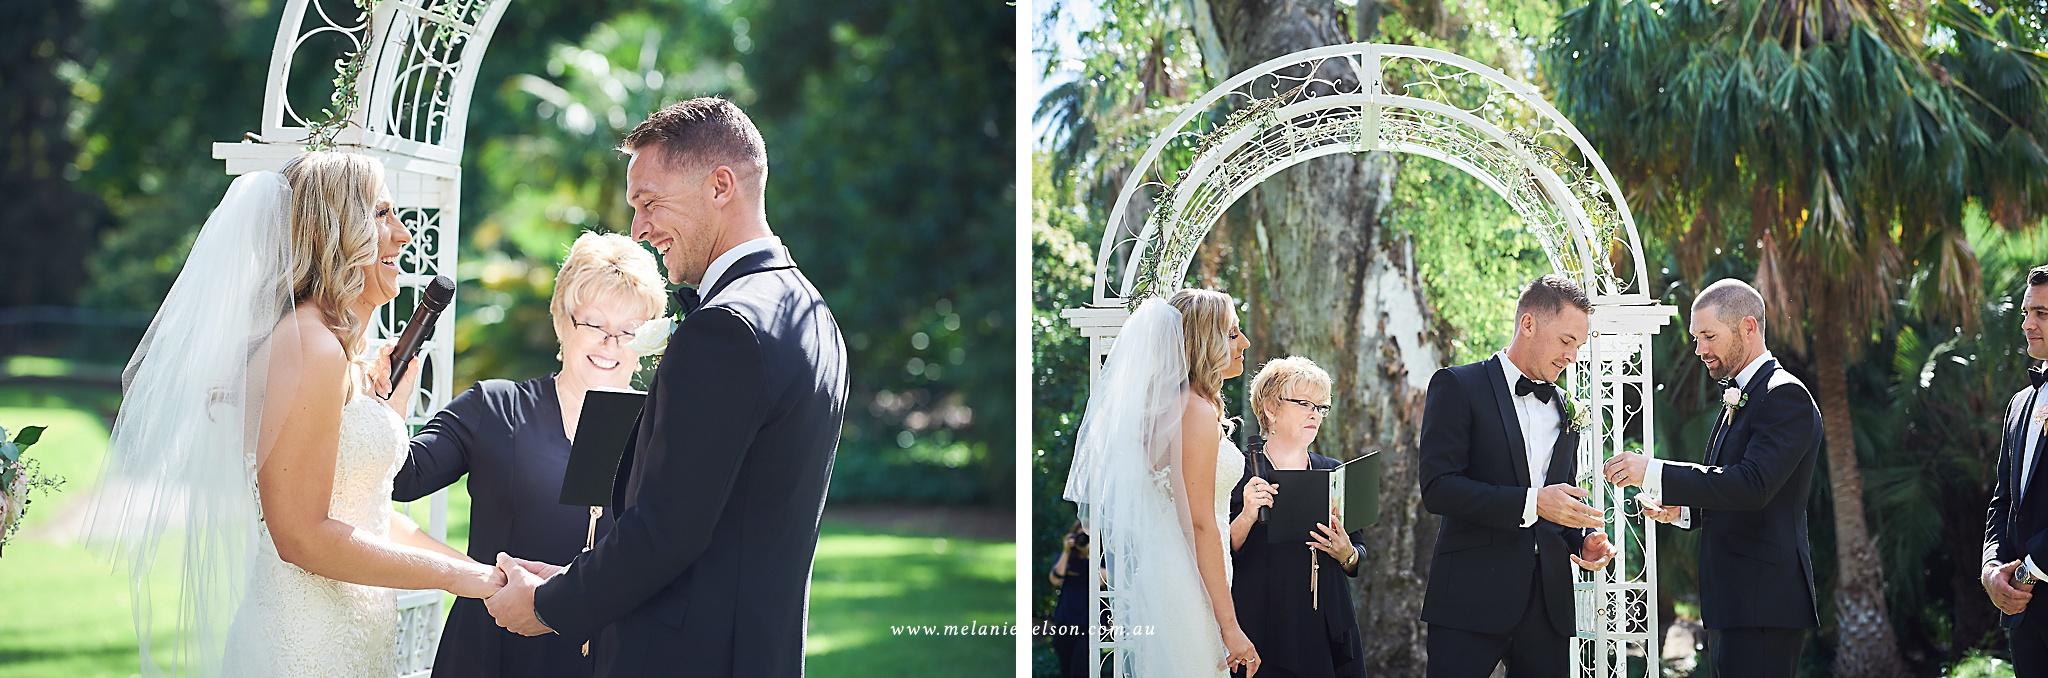 adelaide_botanic_gardens_wedding_0020.jpg